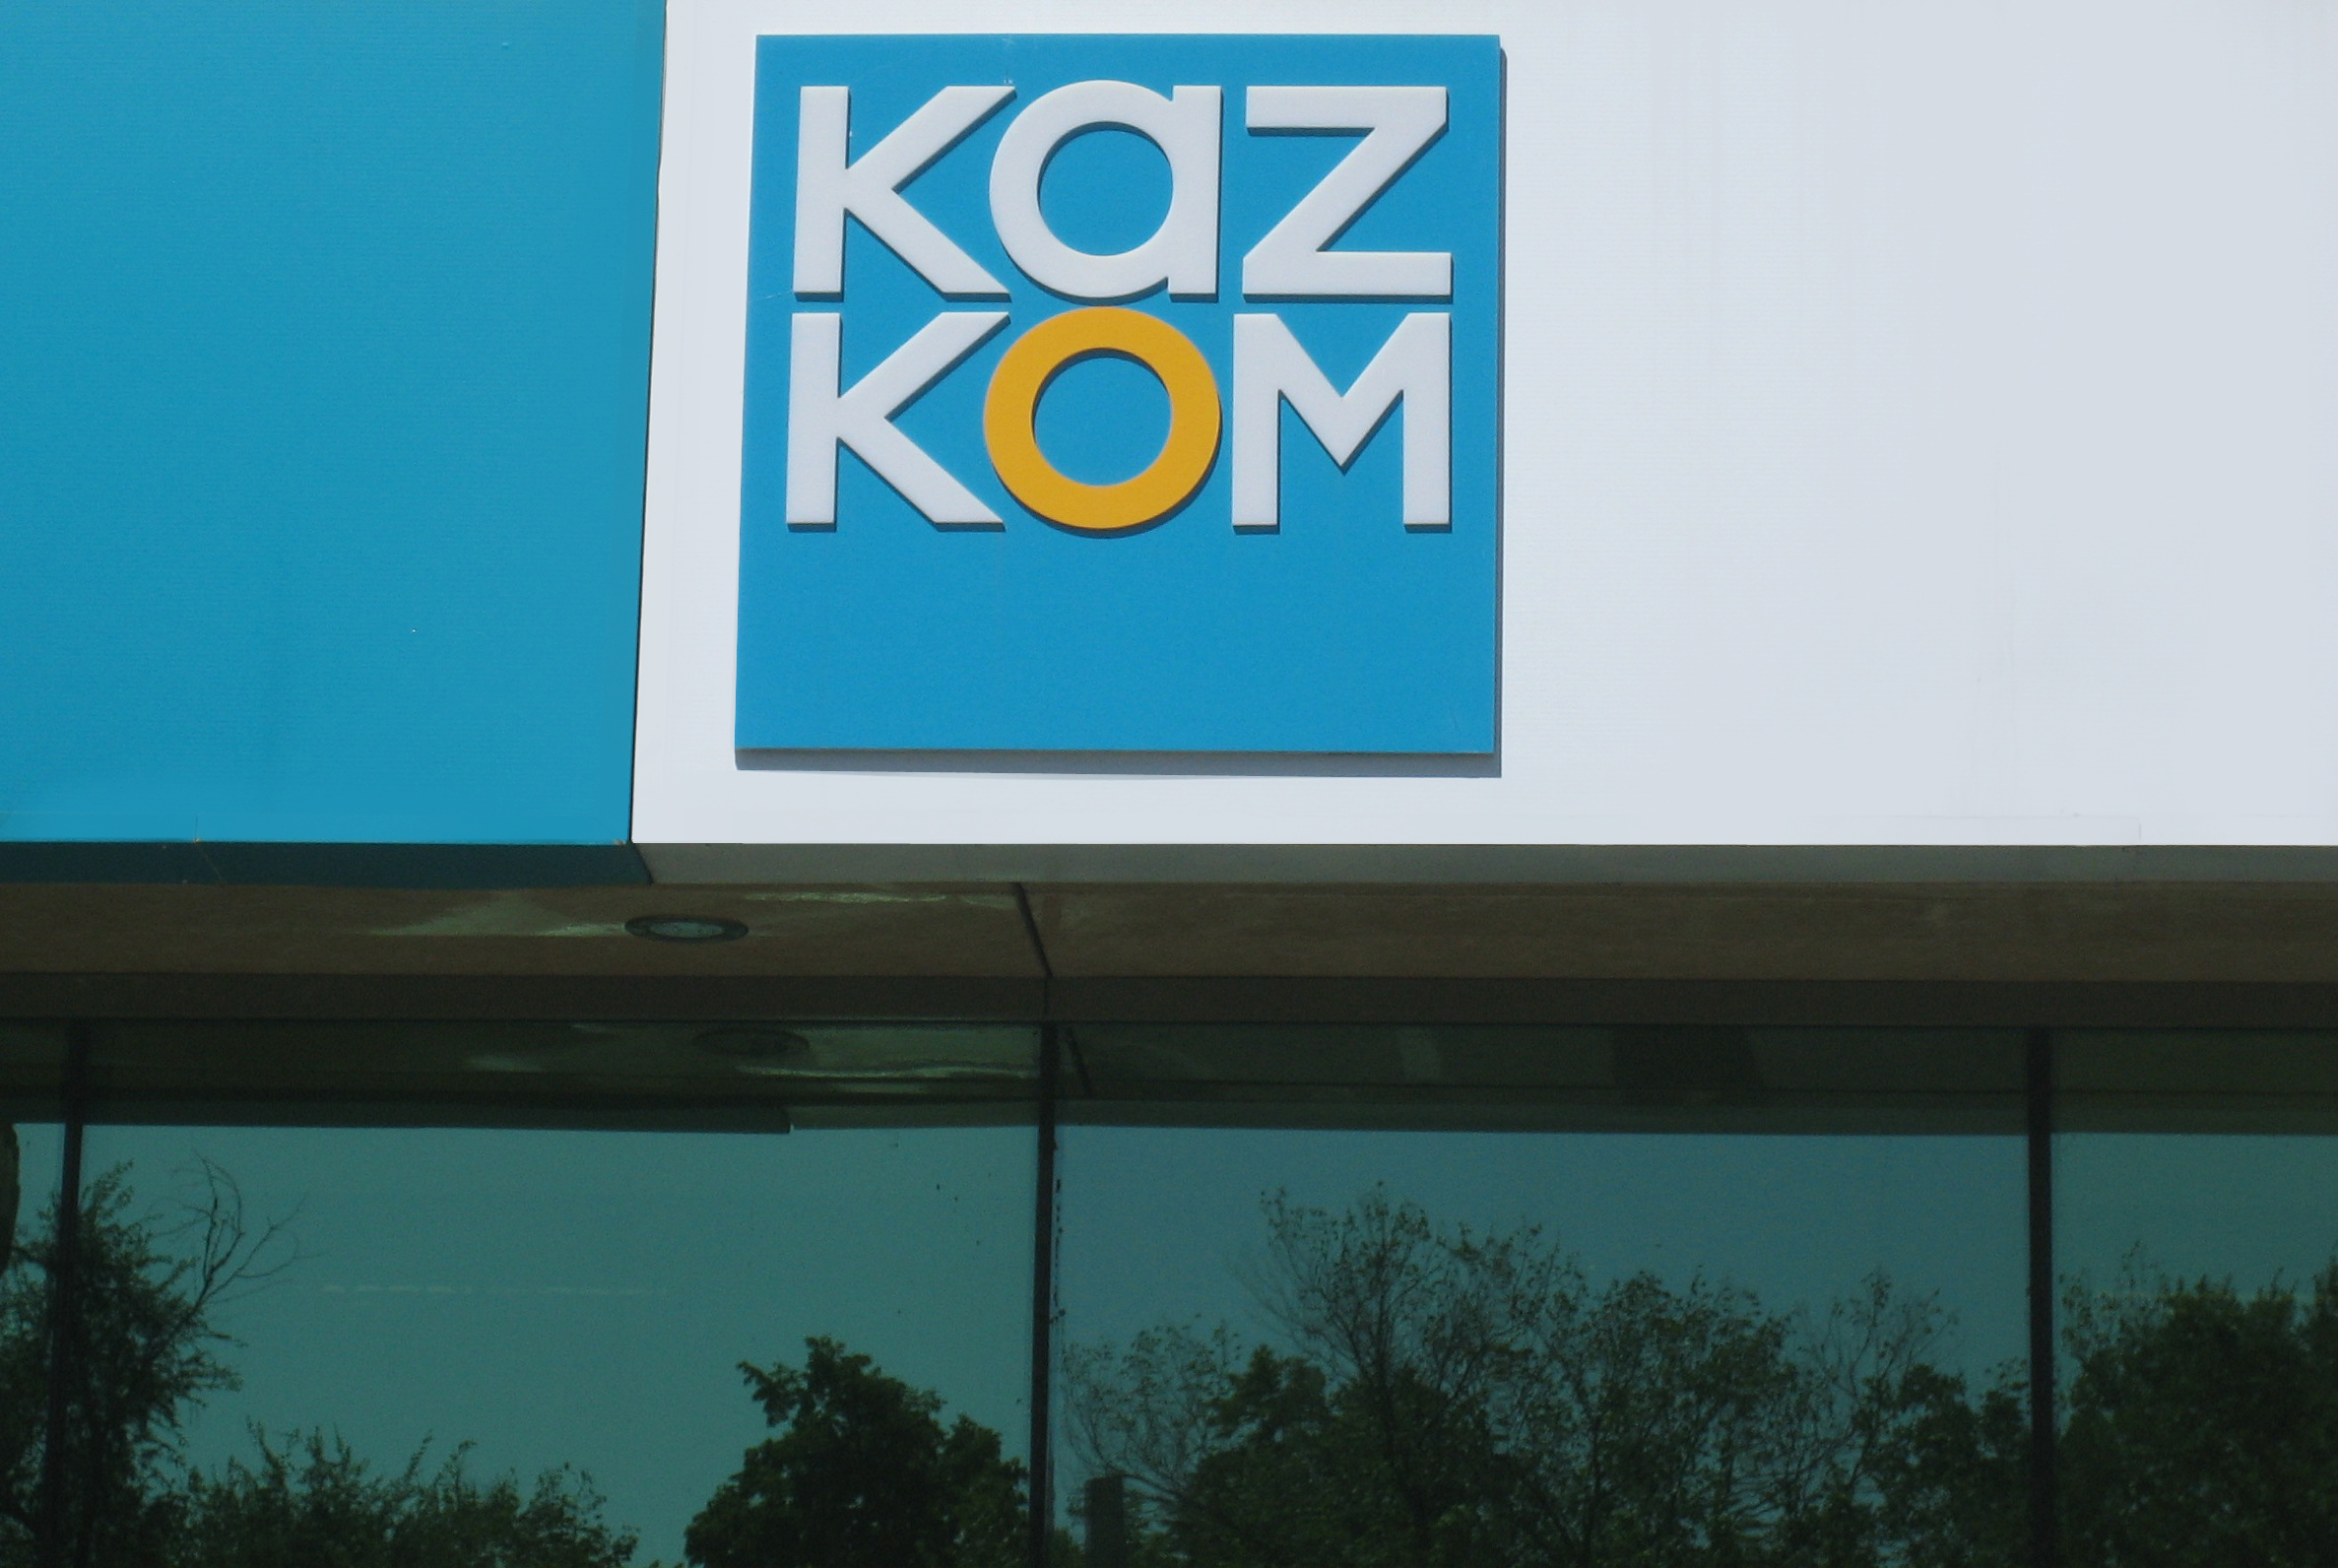 Депозиты покидают Казкоммерцбанк